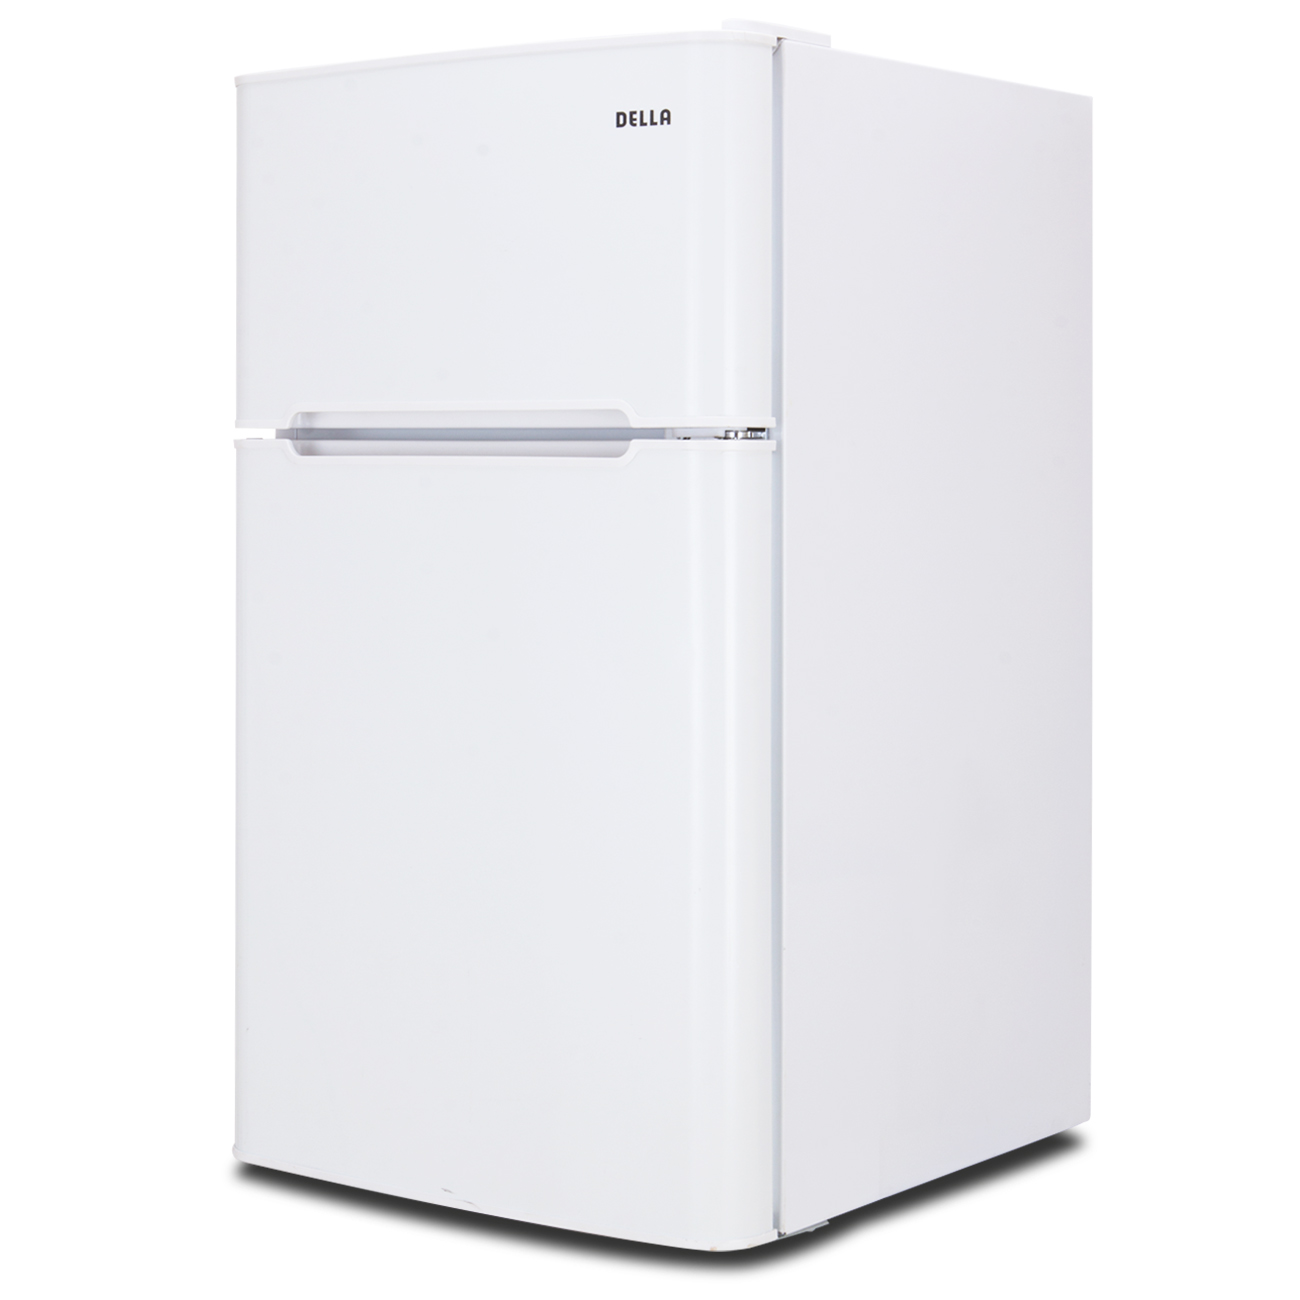 office mini refrigerator. Mini Refrigerator Freezer 3.2 Cu Ft Small Fridge 2 Door Office Dorm Cooler White C